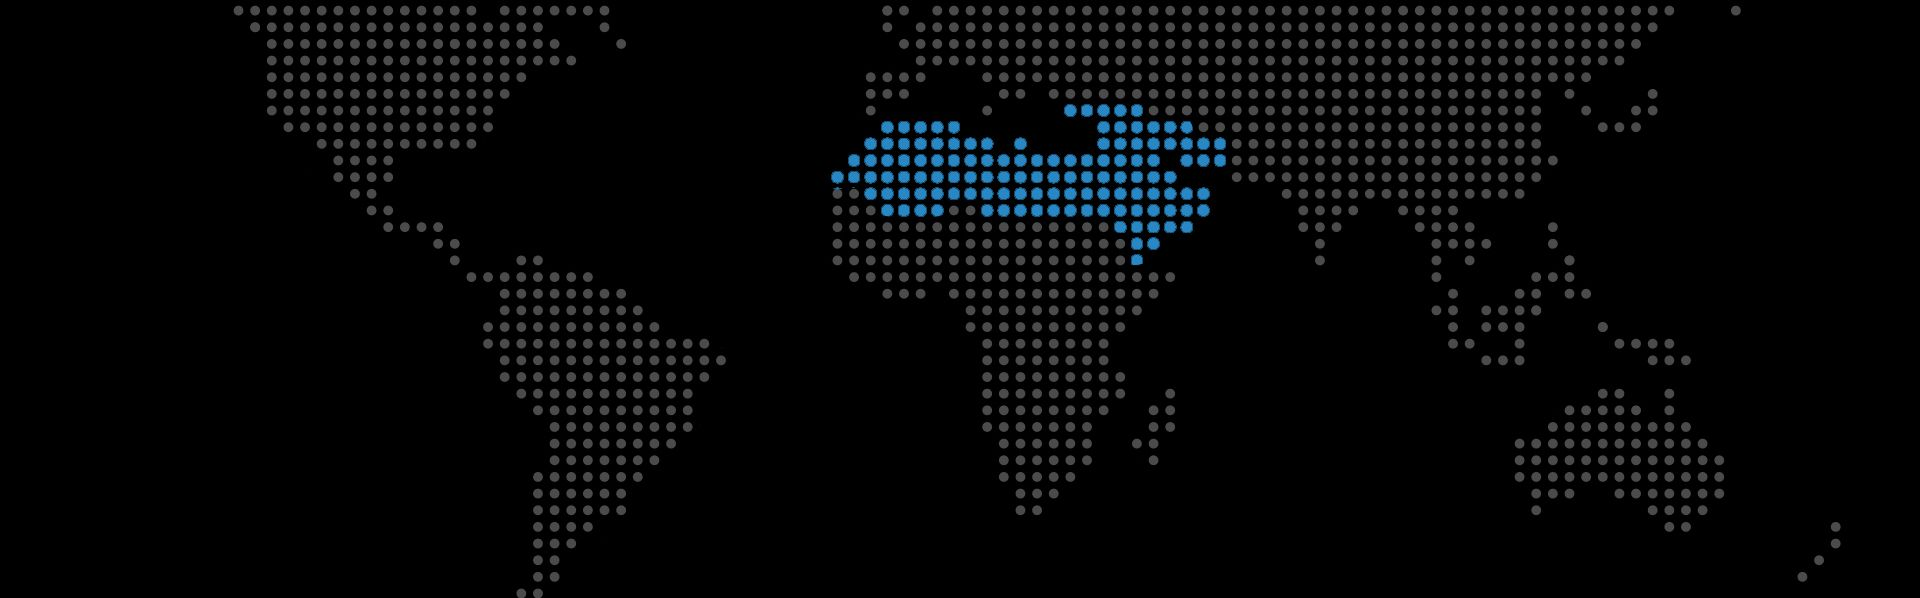 Europe - Geopolitics, Analysis and News